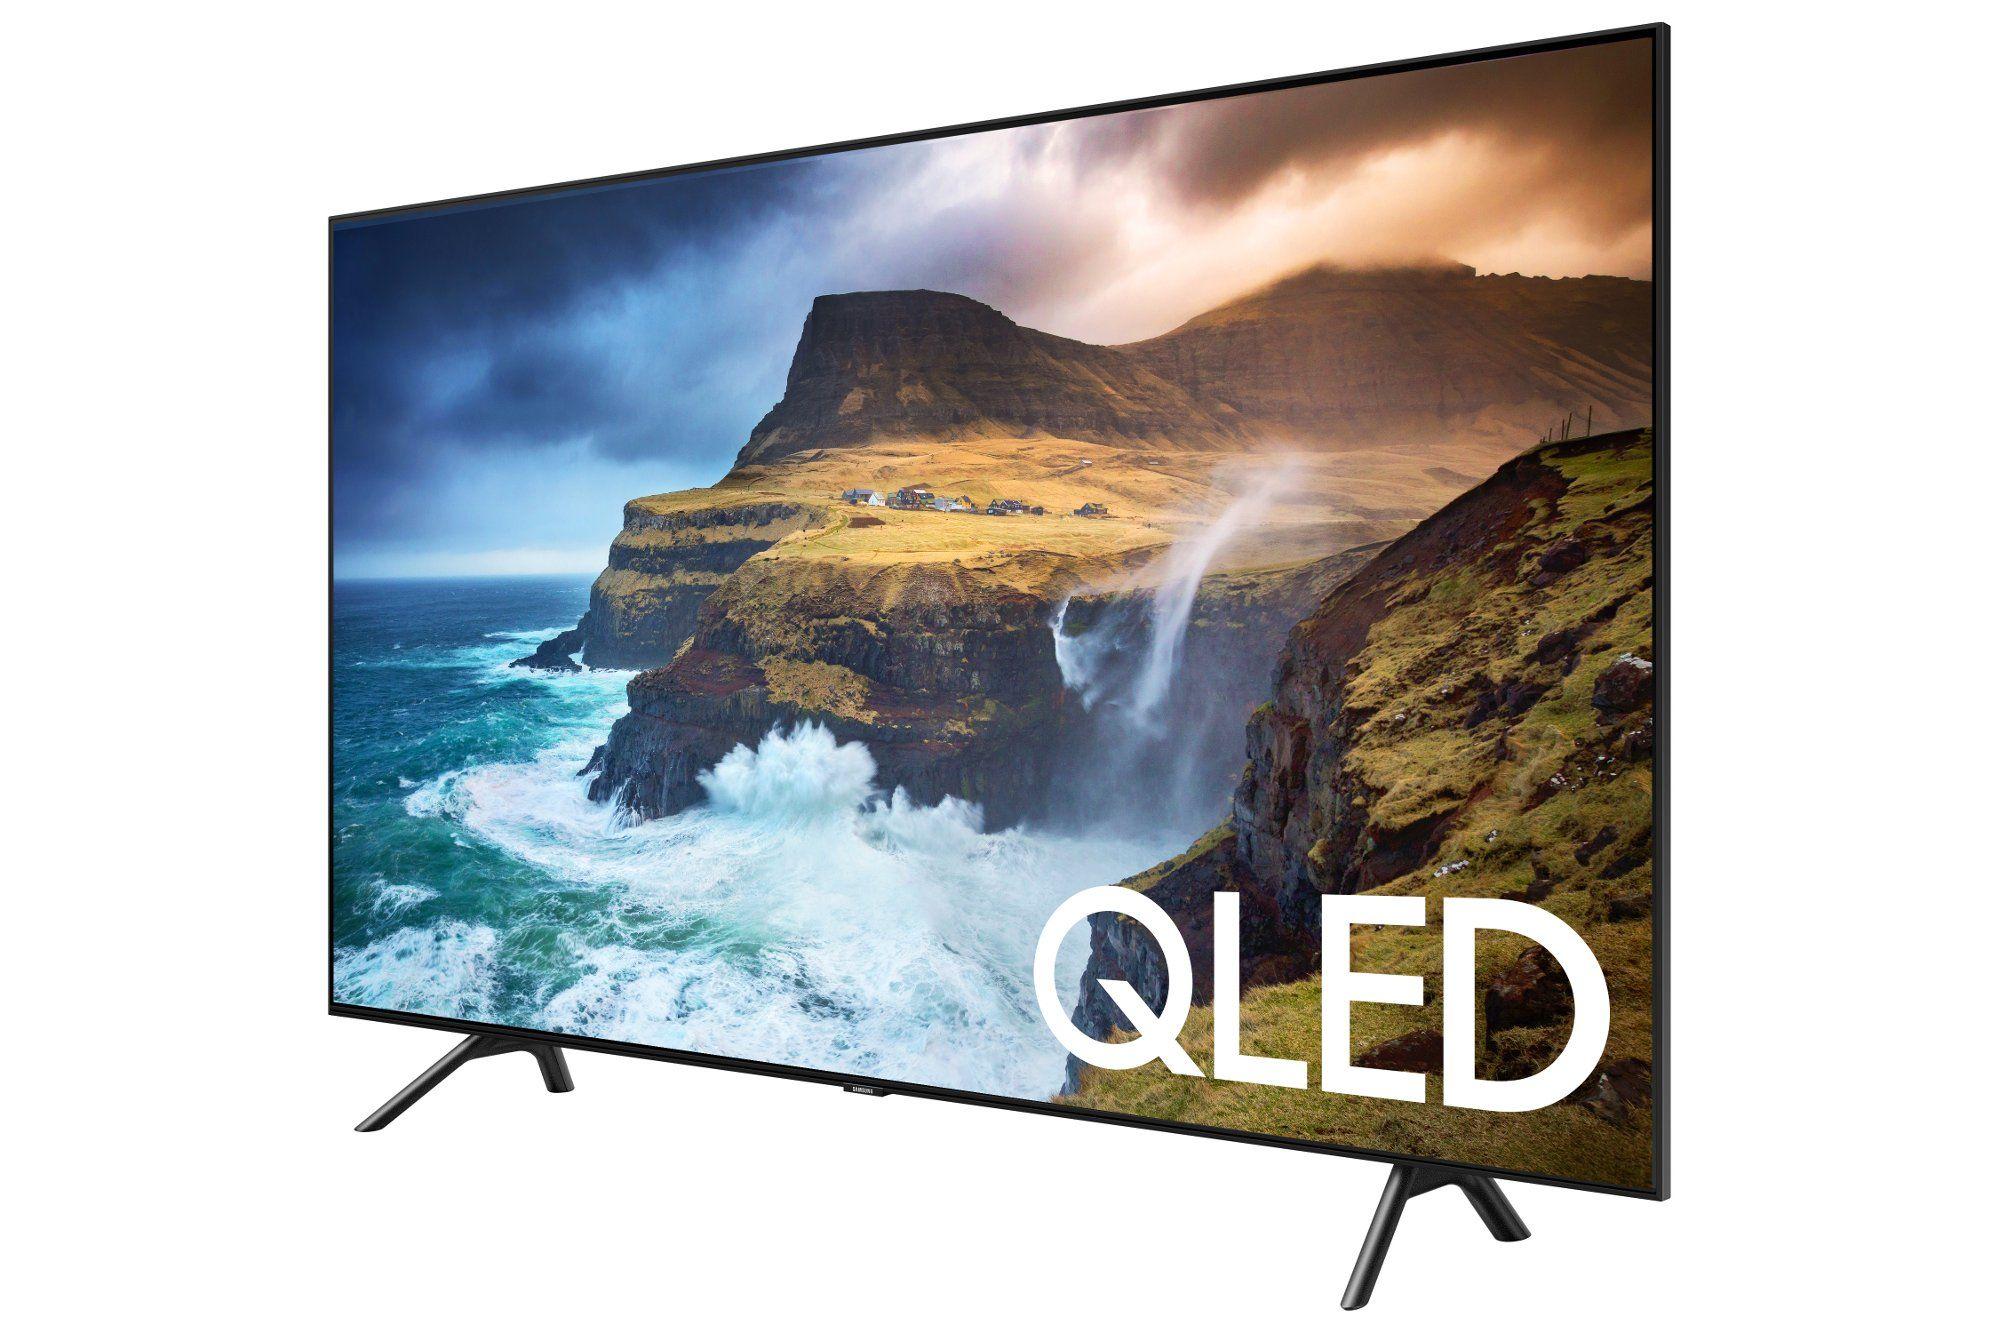 Samsung 75 Inch QLED 4K UHD Q70 Series Smart TV Smart tv